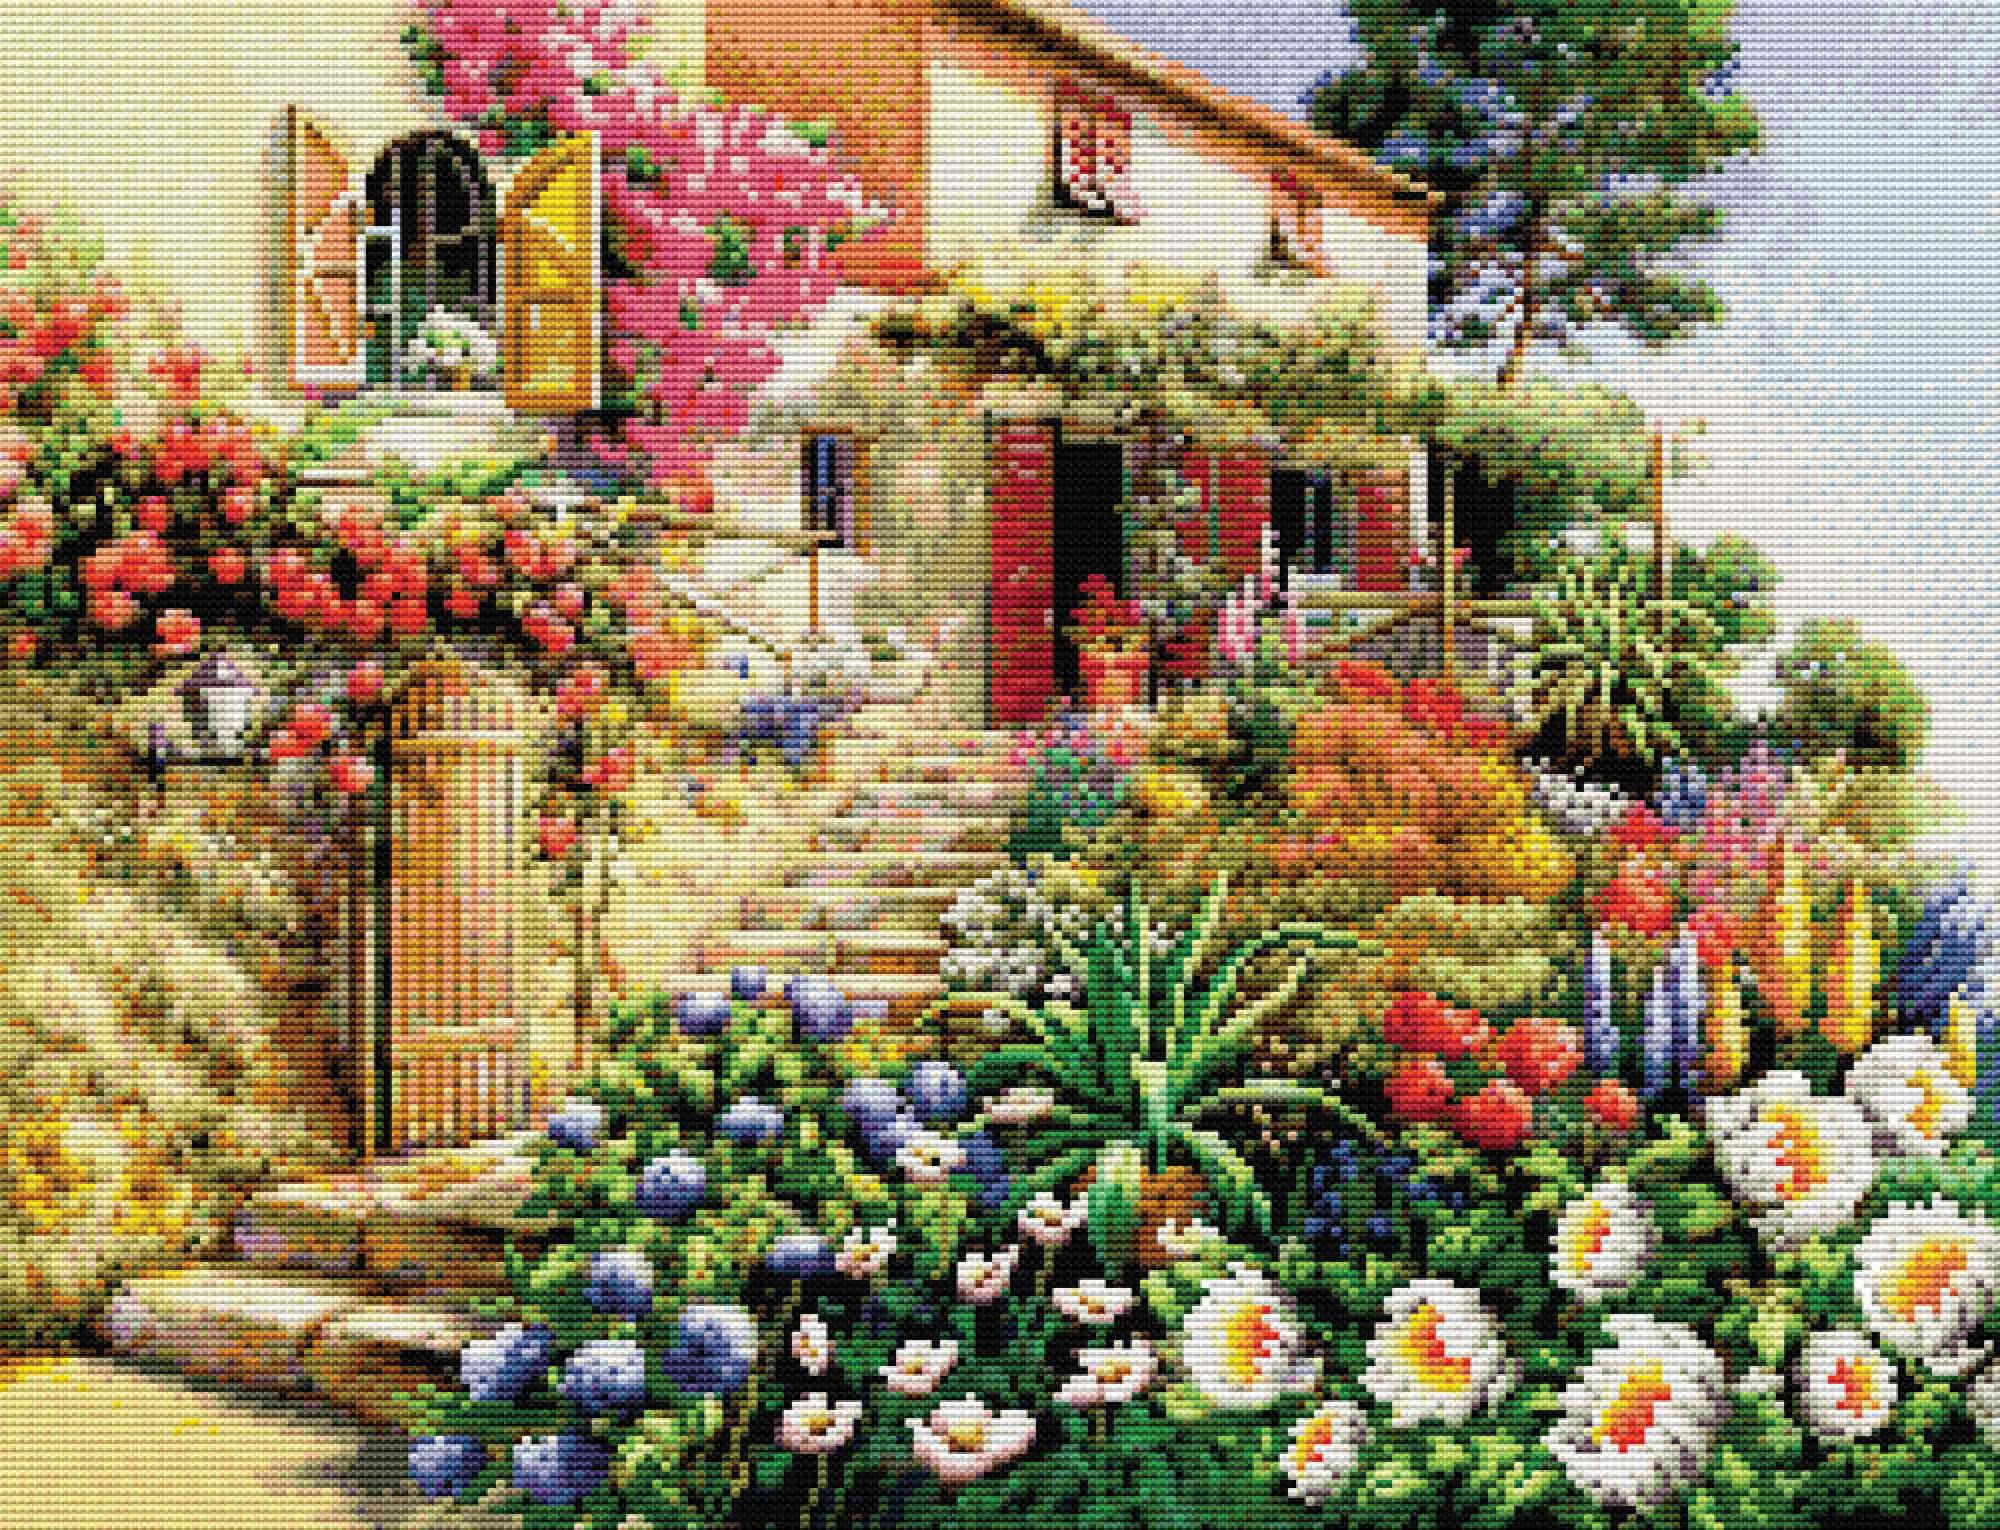 Вышивка крестом домики дворики улочки 98